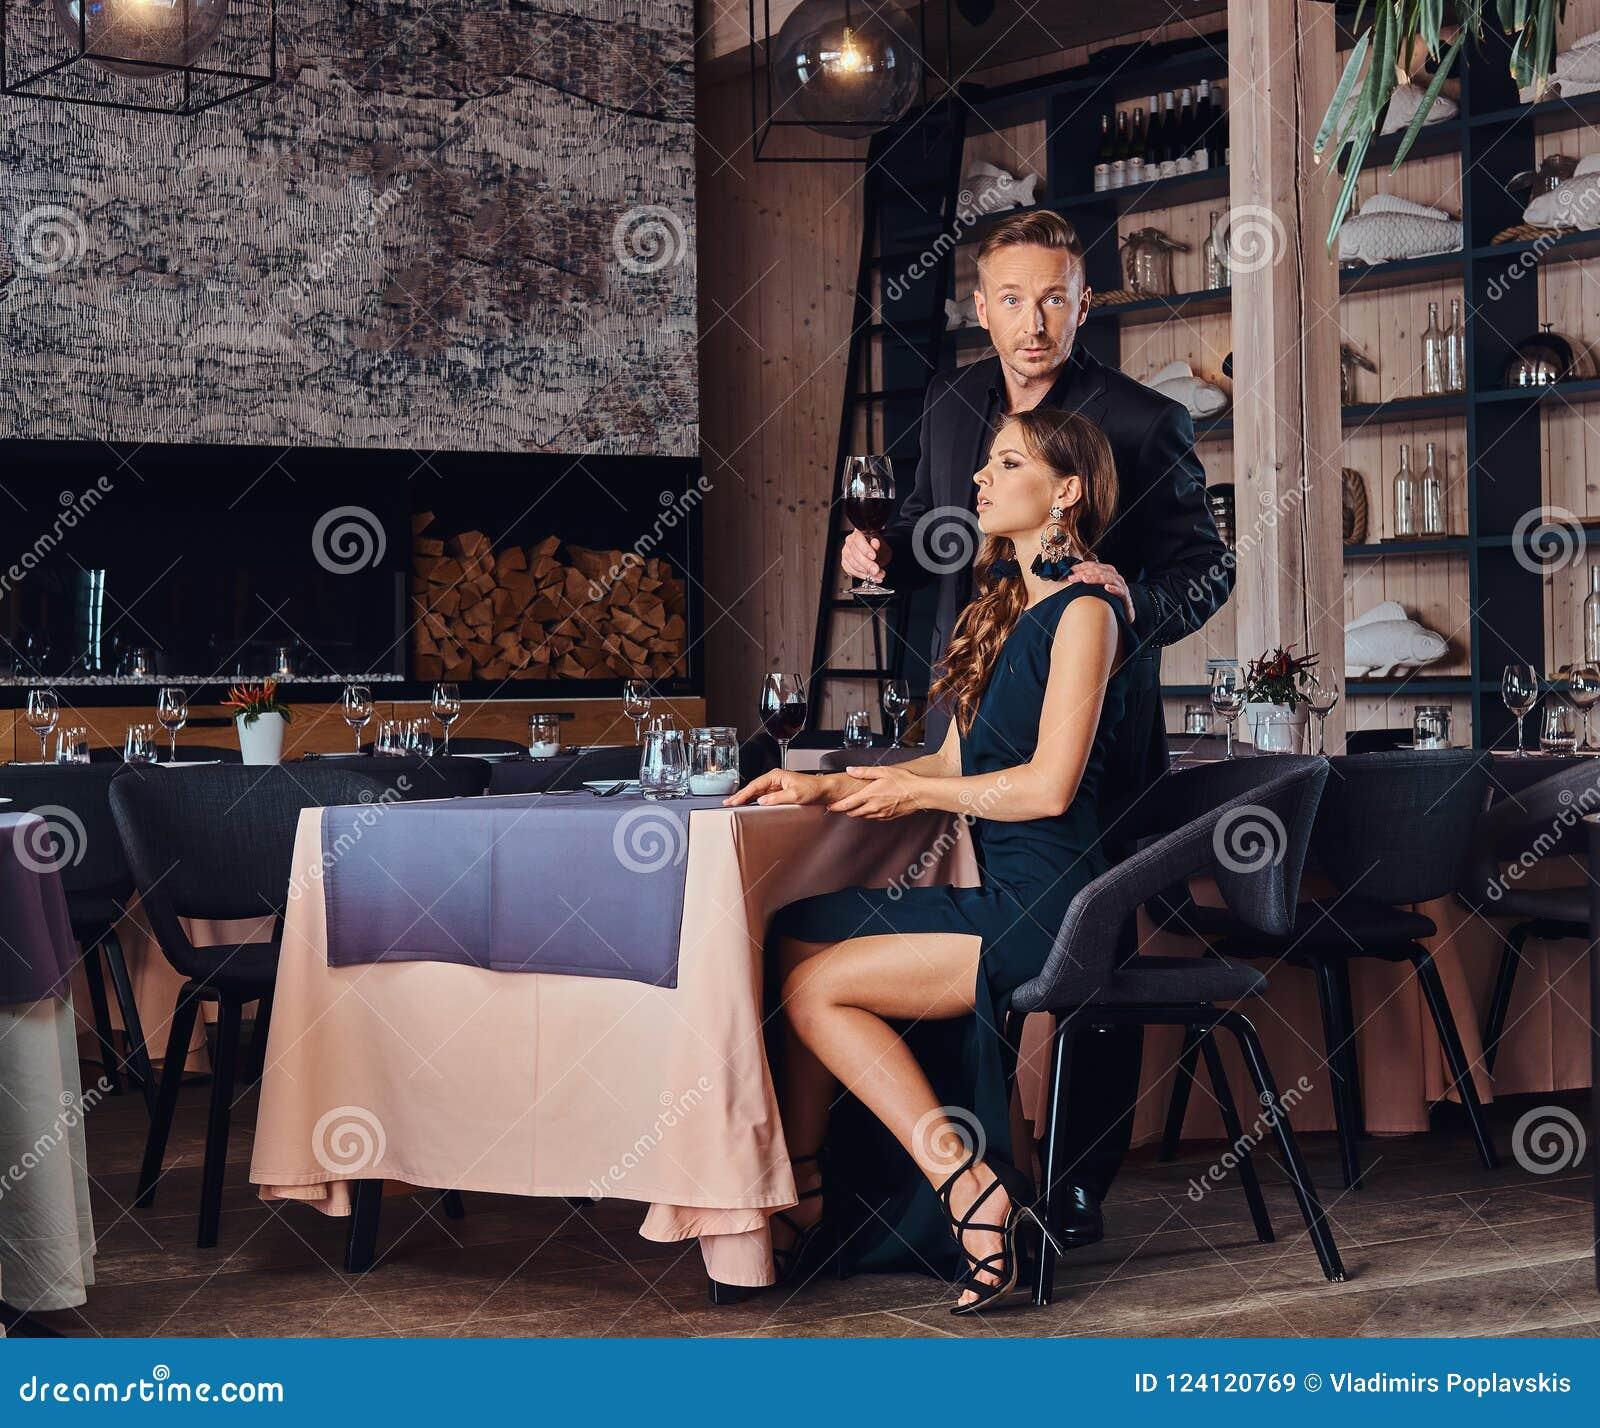 Dating room salon girl